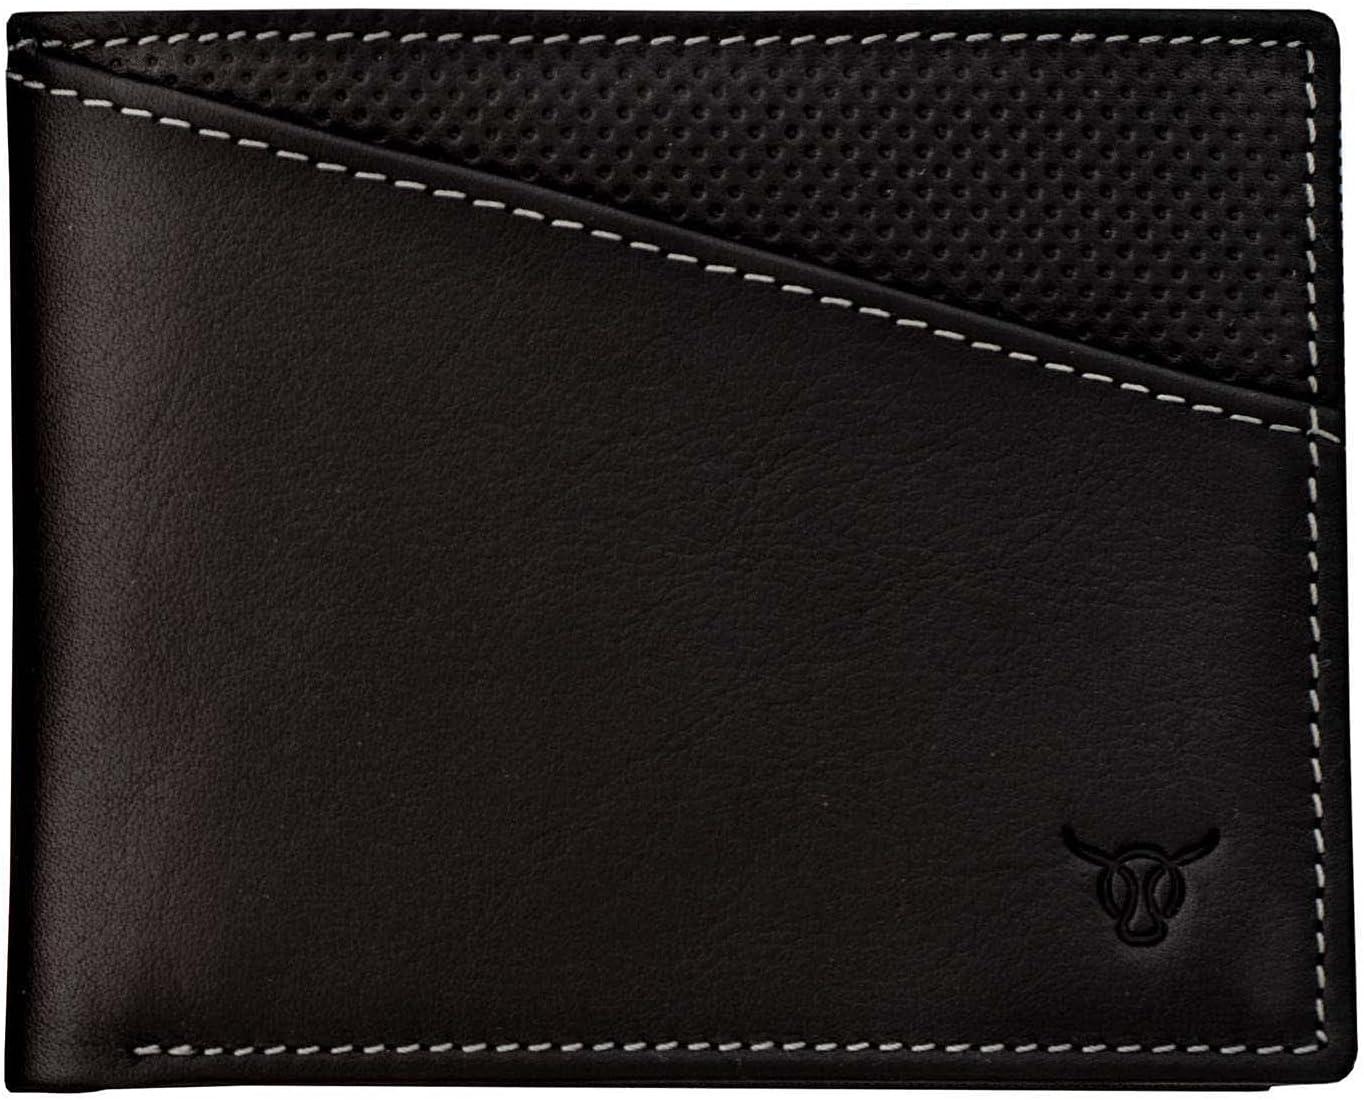 Vasa Midnight Horizontal Top Grain Leather Wallets For Men - European Luxury Minimalist Bifold Wallet with RFID and NFC Blocking Credit Card Holder - Premium Mens Slim Bi Fold Pocket Wallet